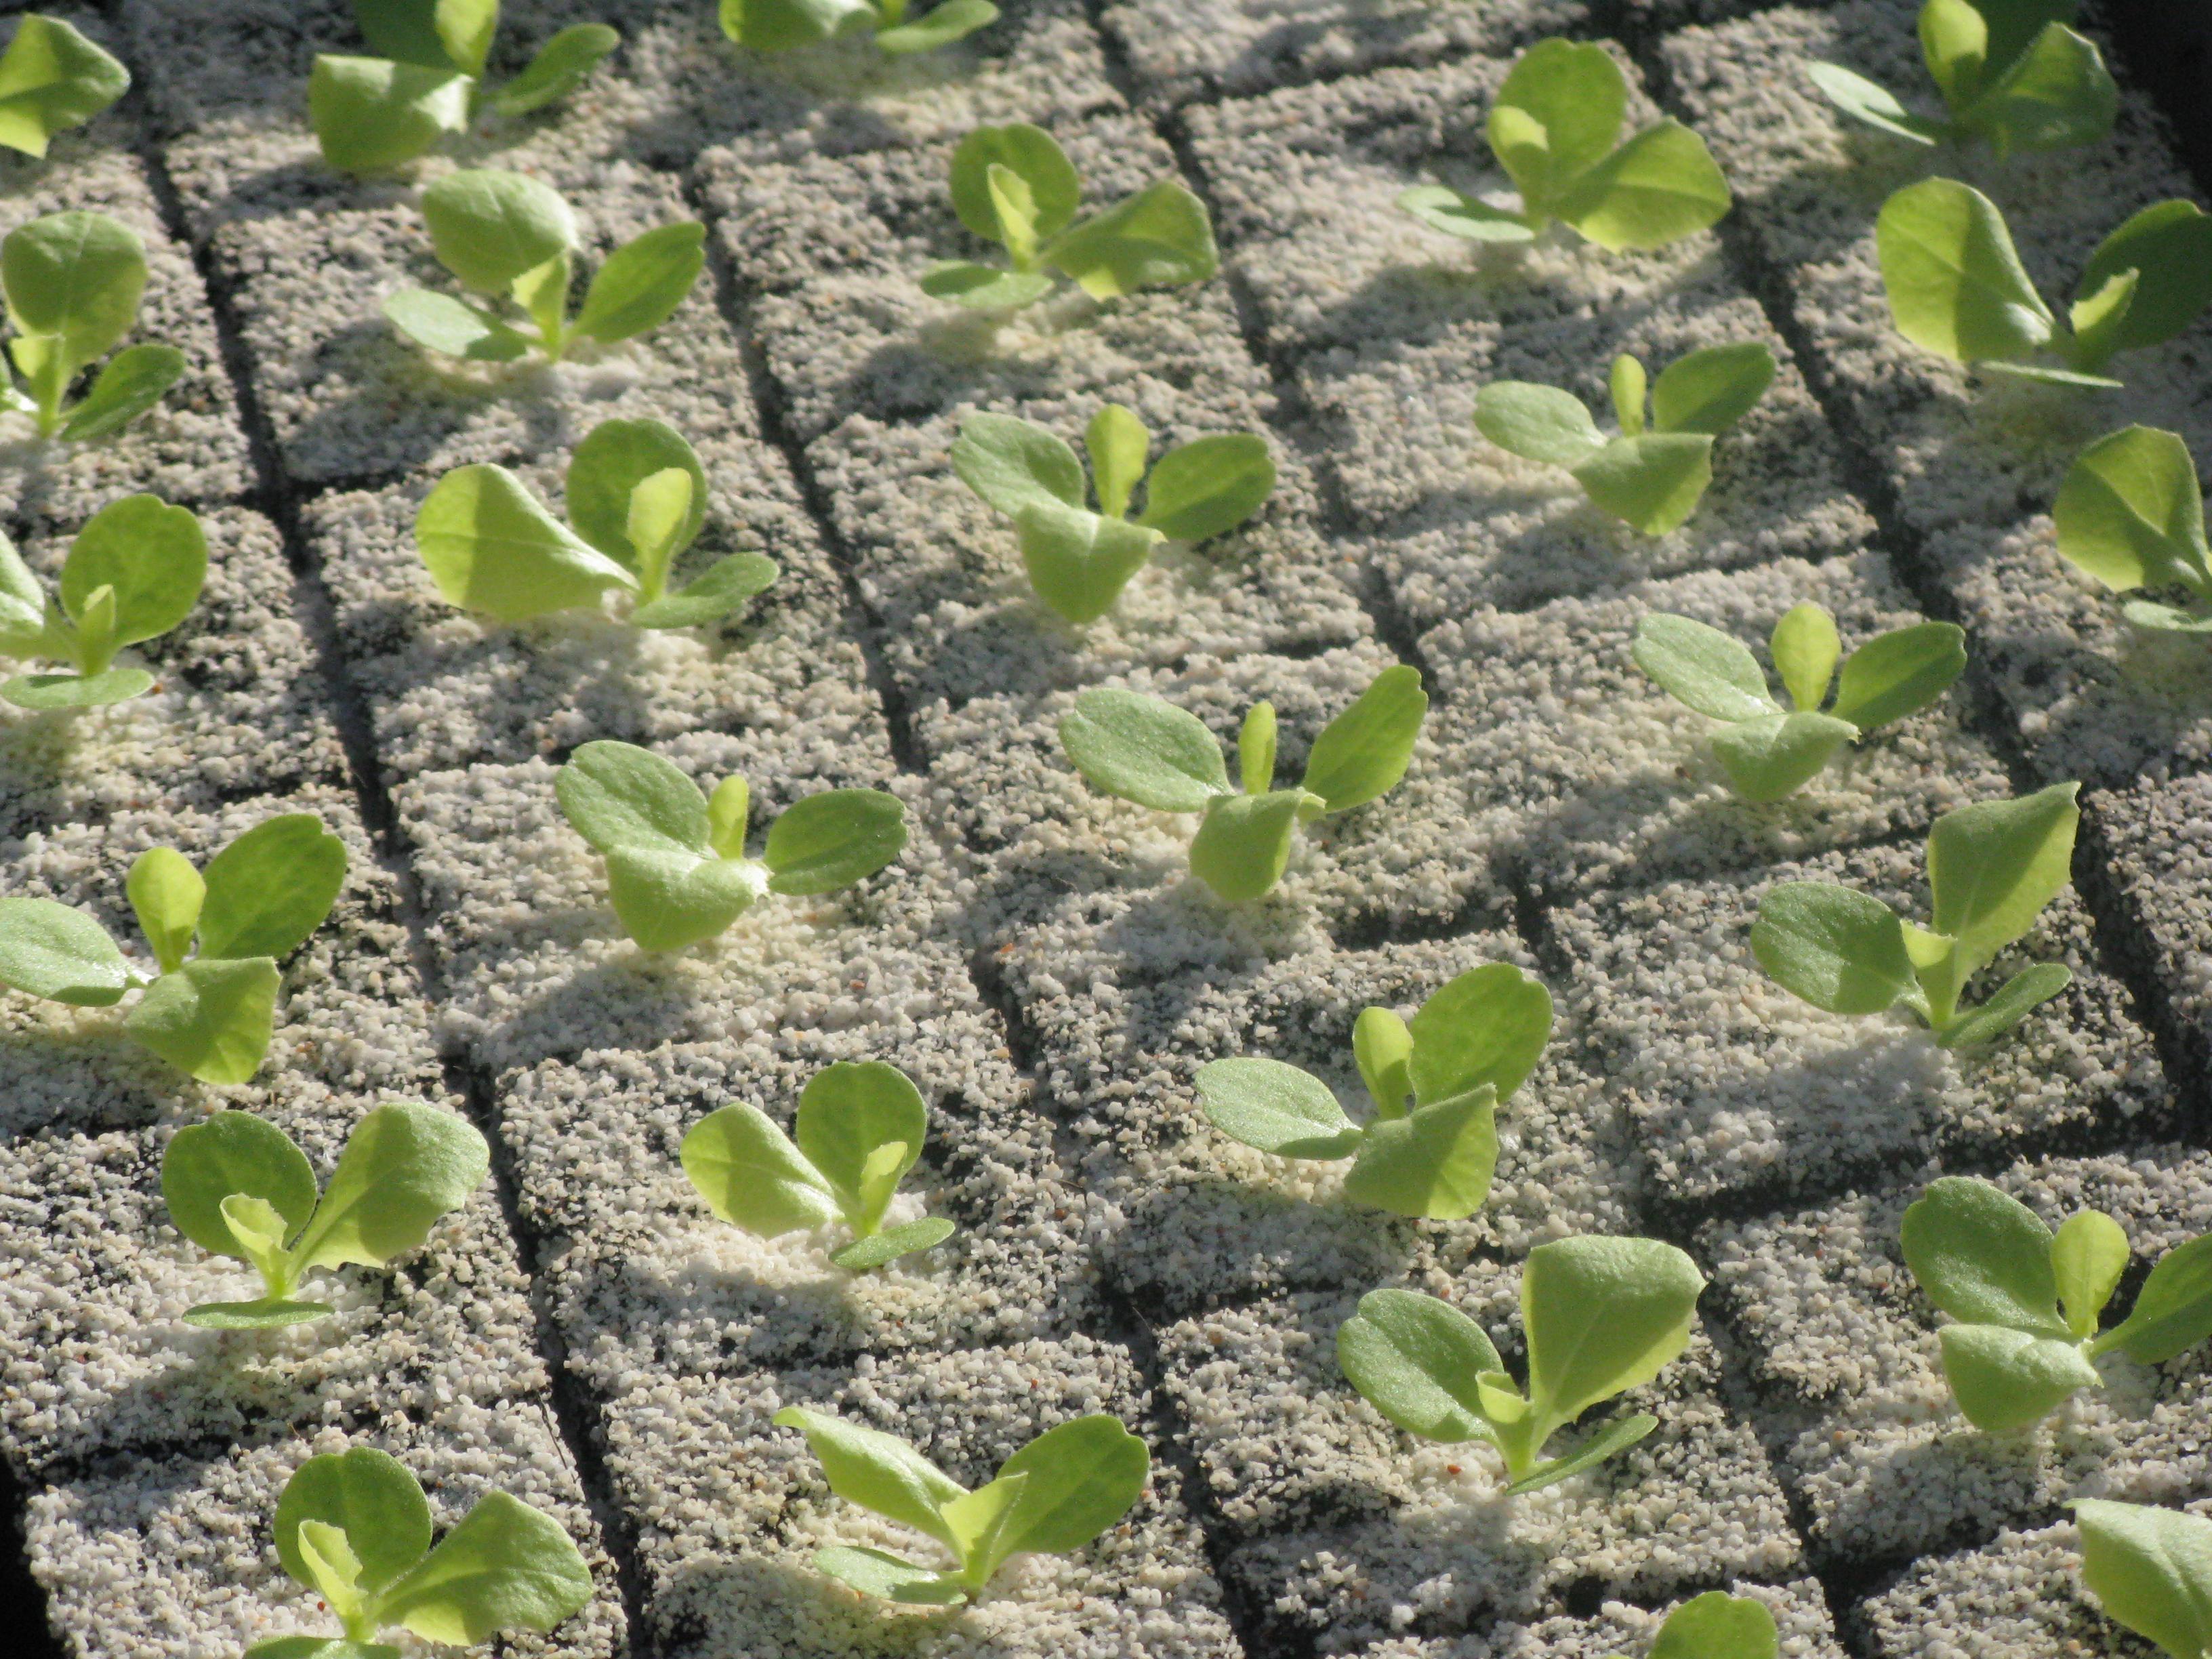 la cha ne de production de salades hortival plants maraichers. Black Bedroom Furniture Sets. Home Design Ideas